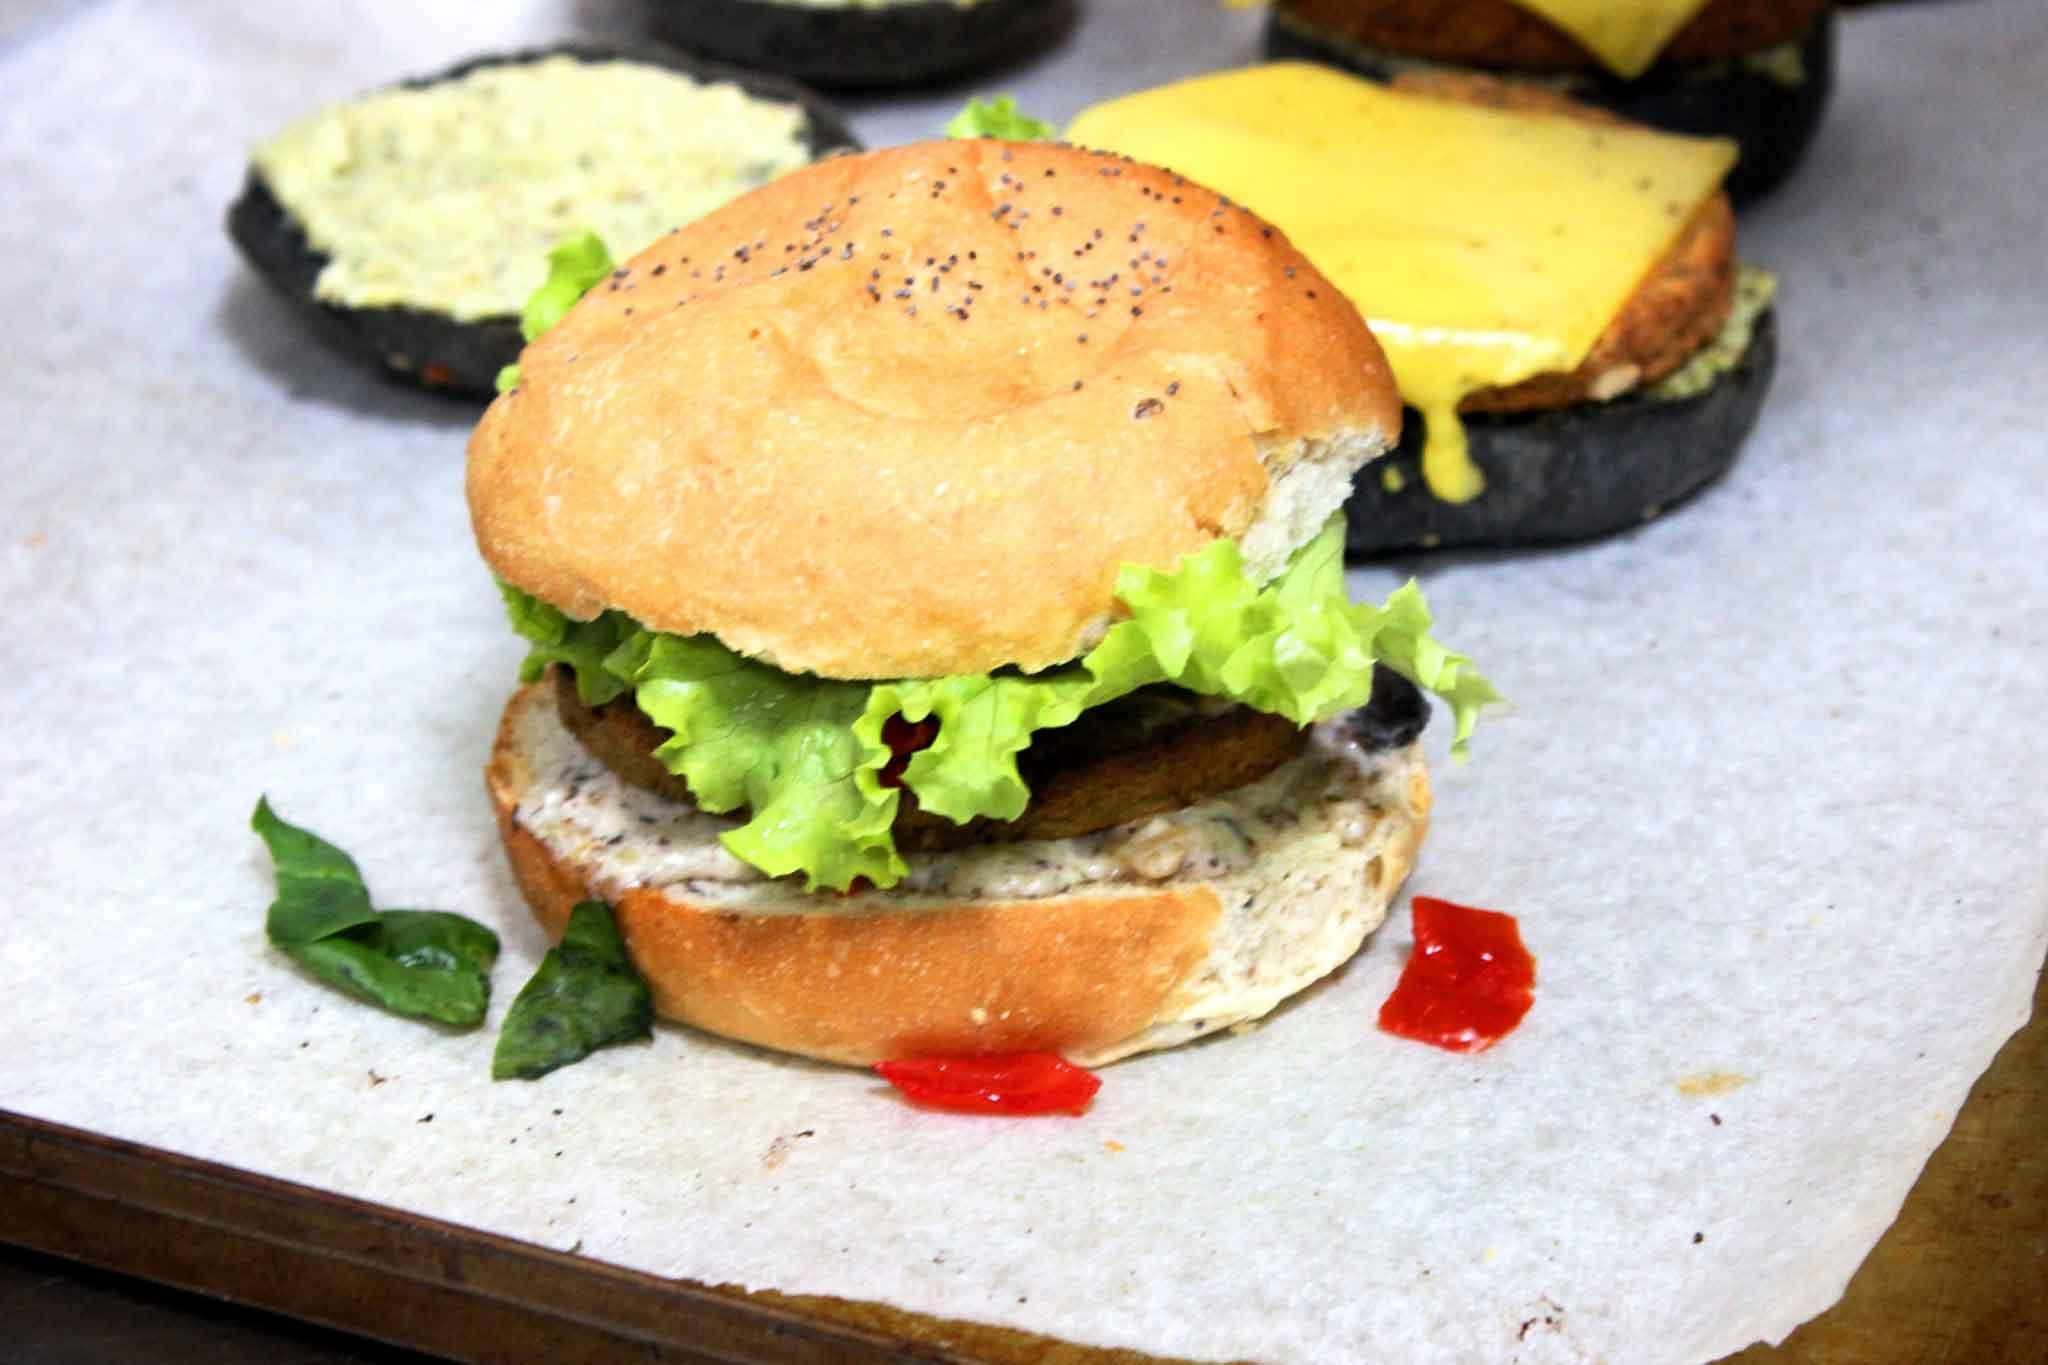 flower-burger-classic-cecio